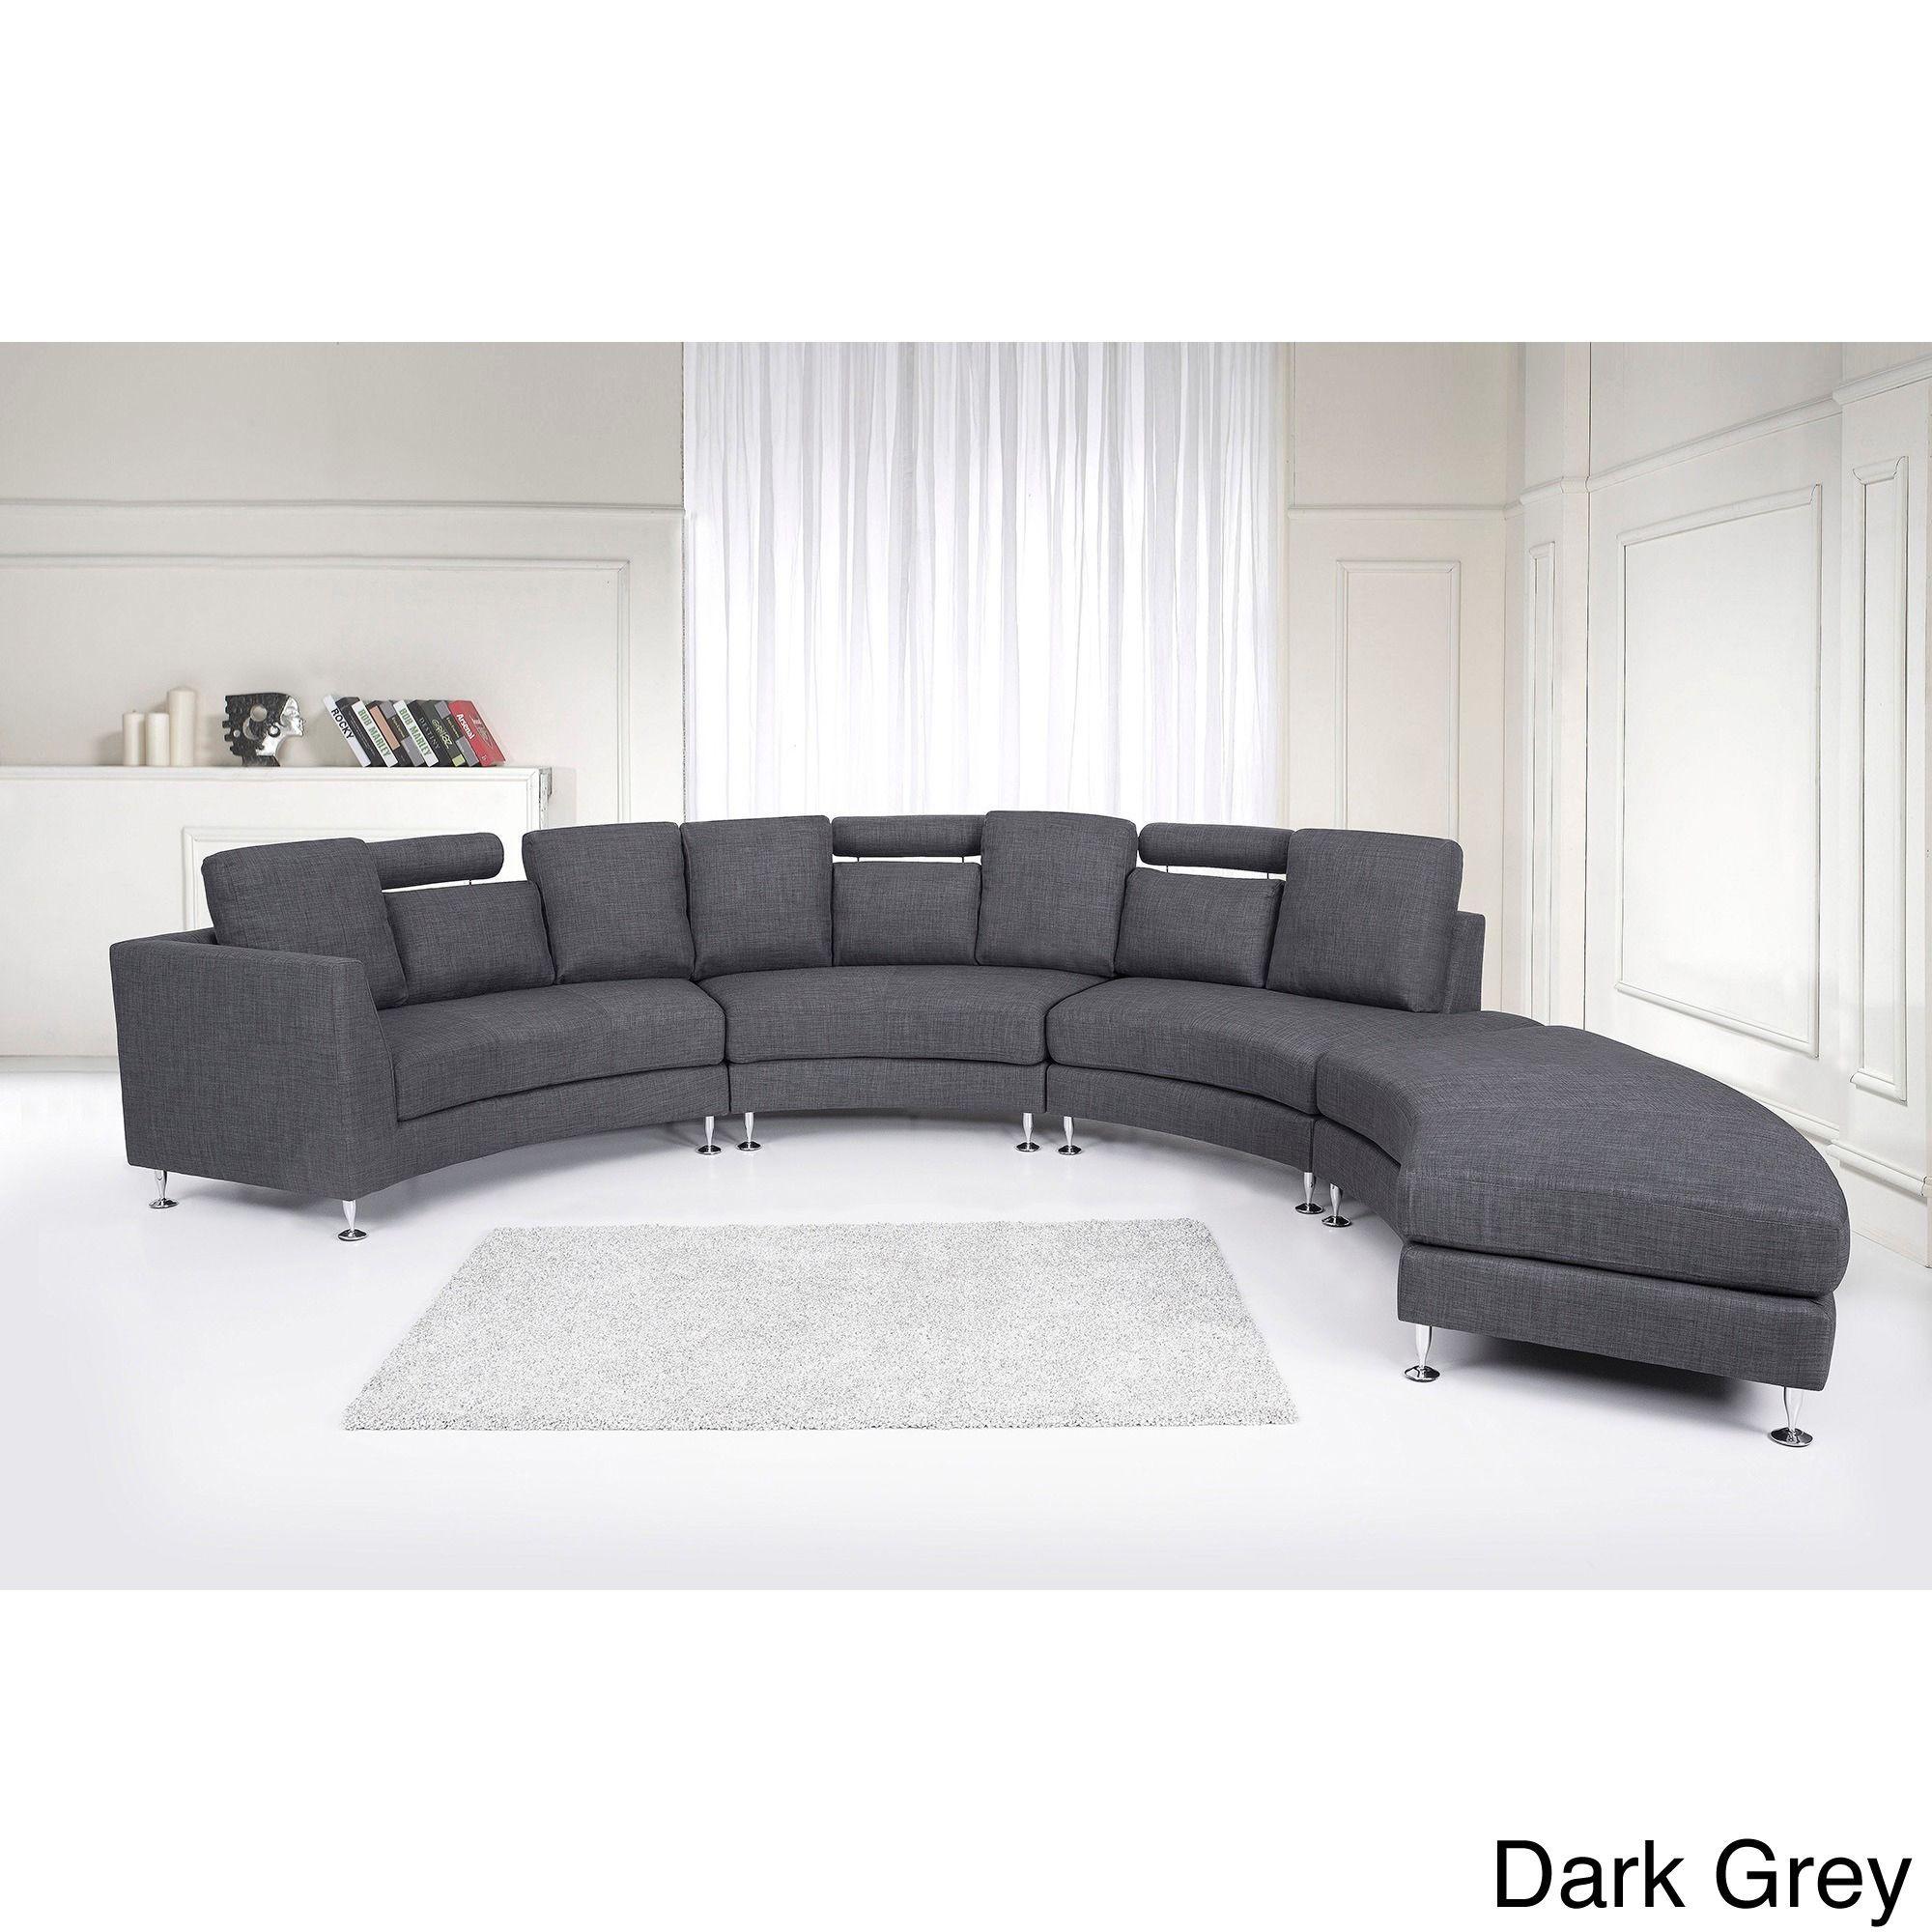 Living Room Furniture Free Shipping Beliani Rotunde Round Fabric Sectional Sofa By Velago Modular